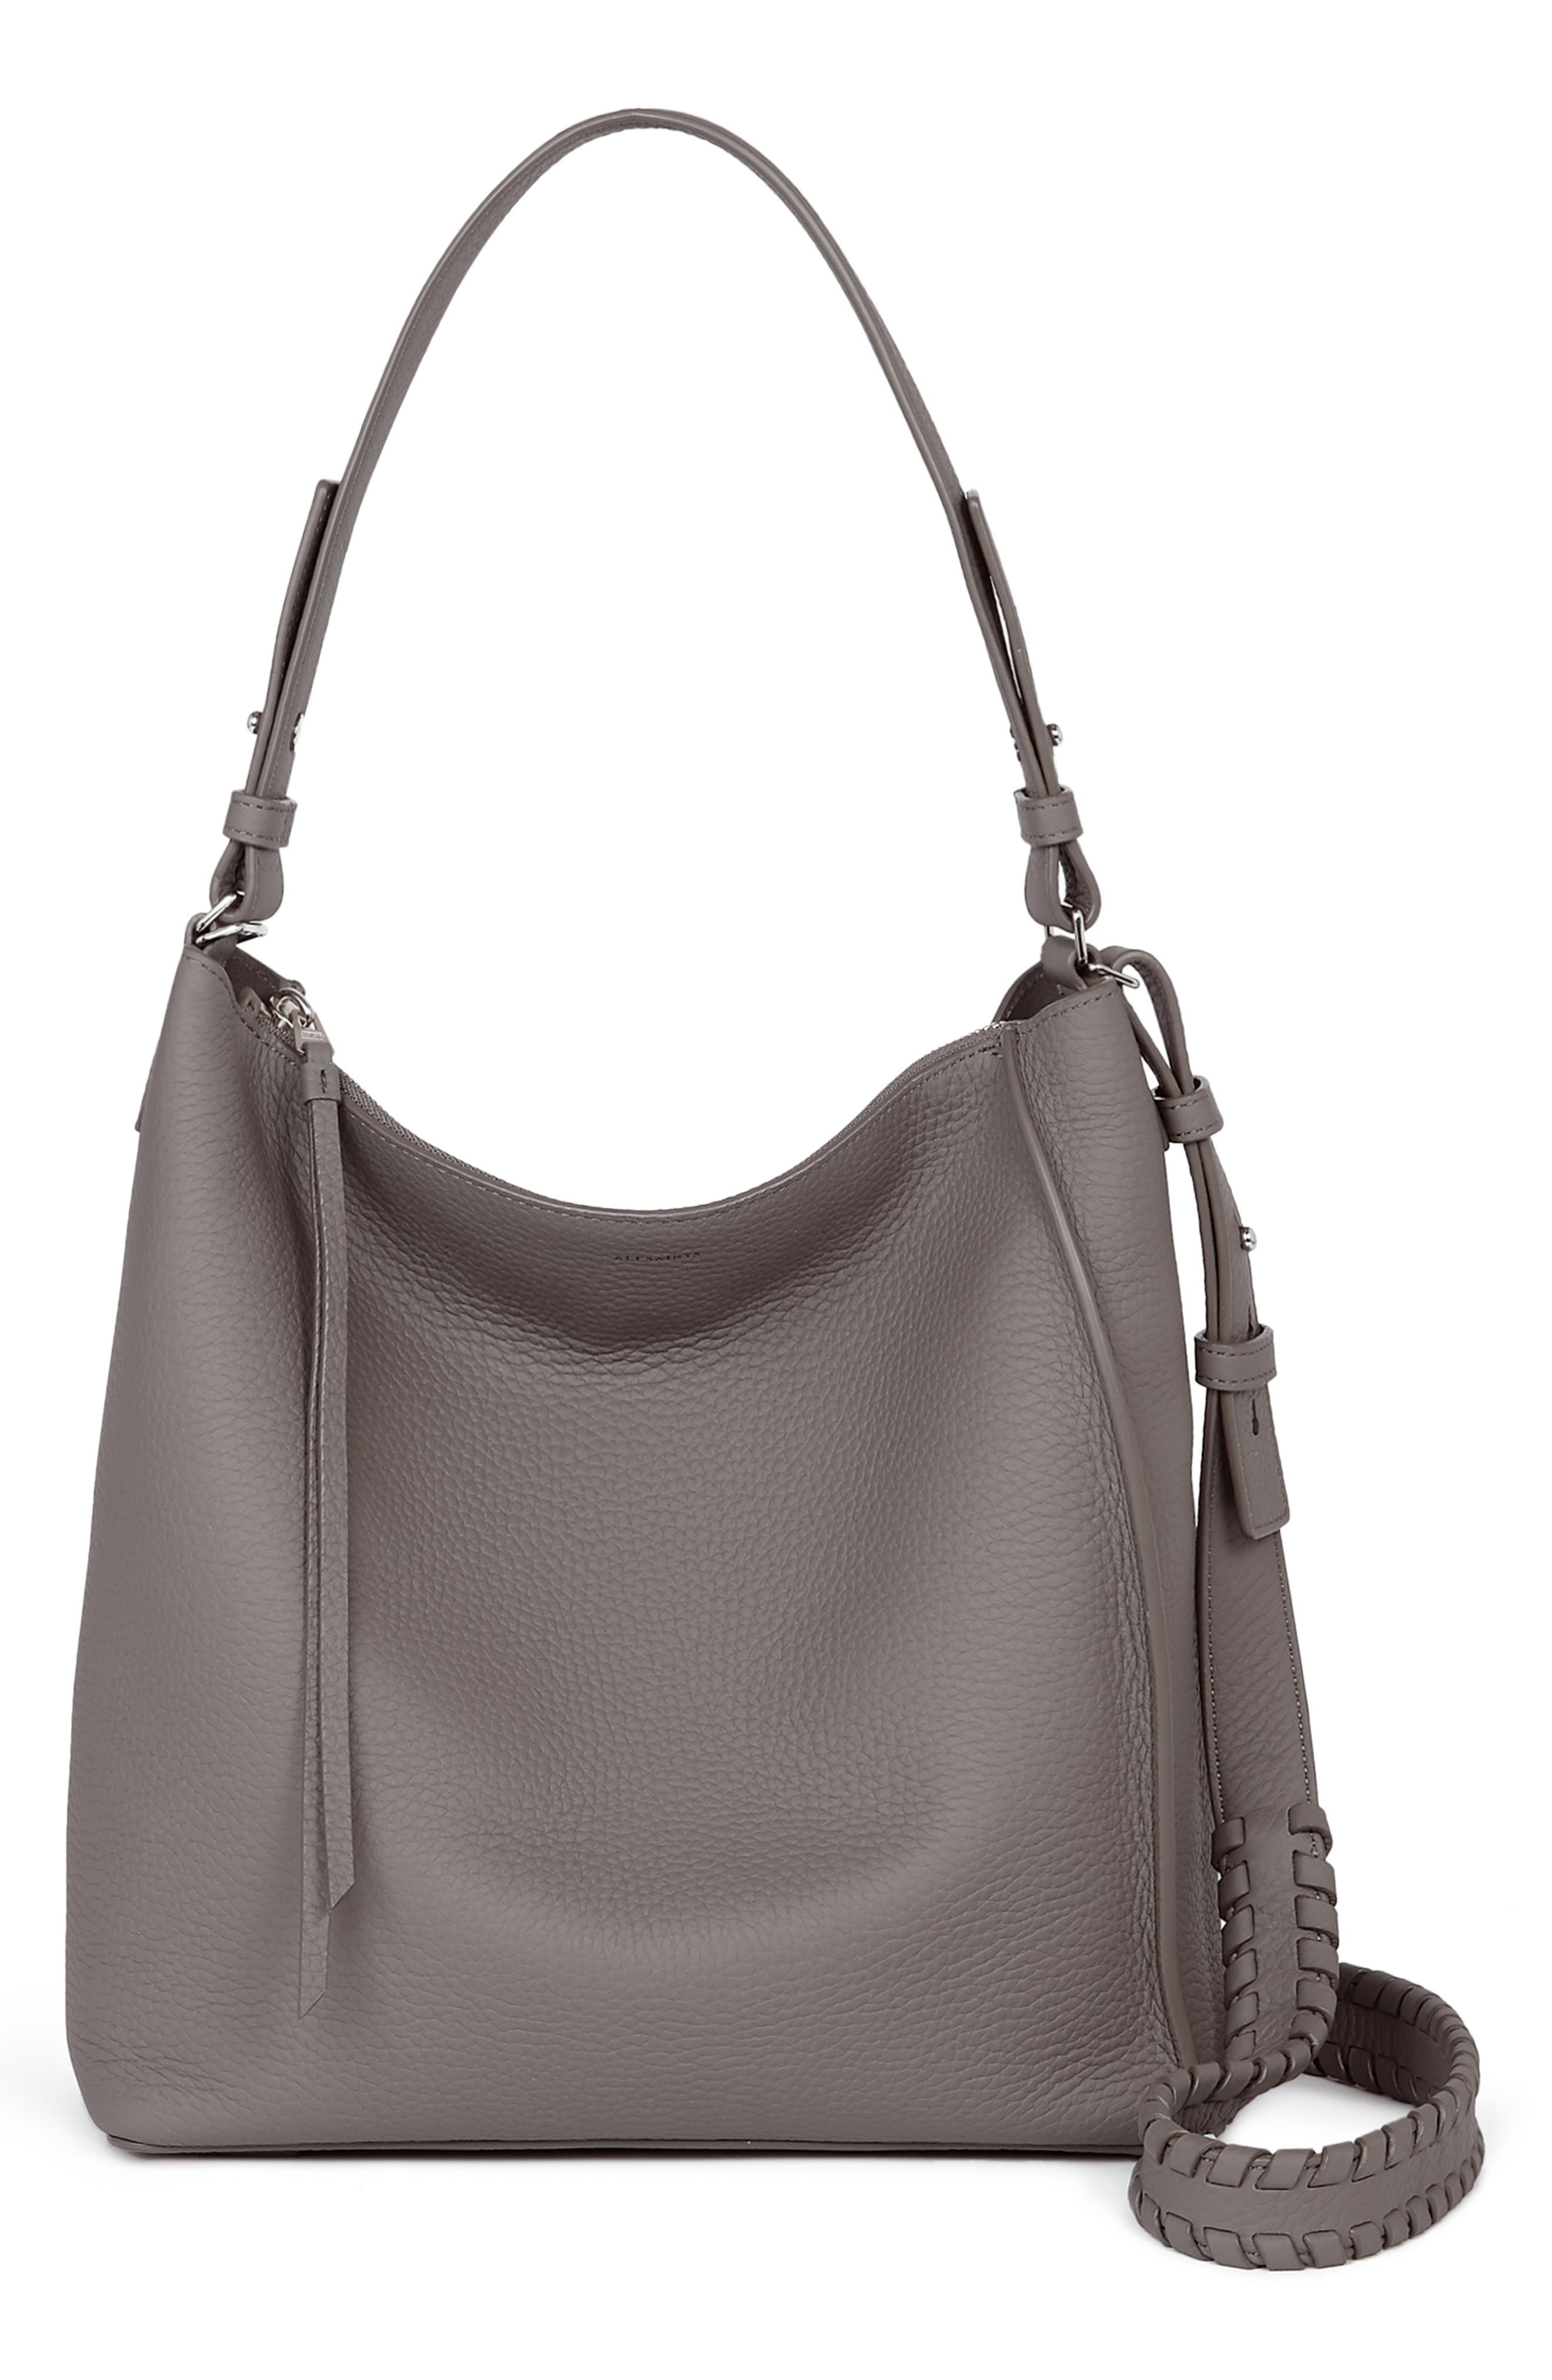 'Kita' Leather Shoulder/Crossbody Bag,                             Main thumbnail 1, color,                             STORM GREY